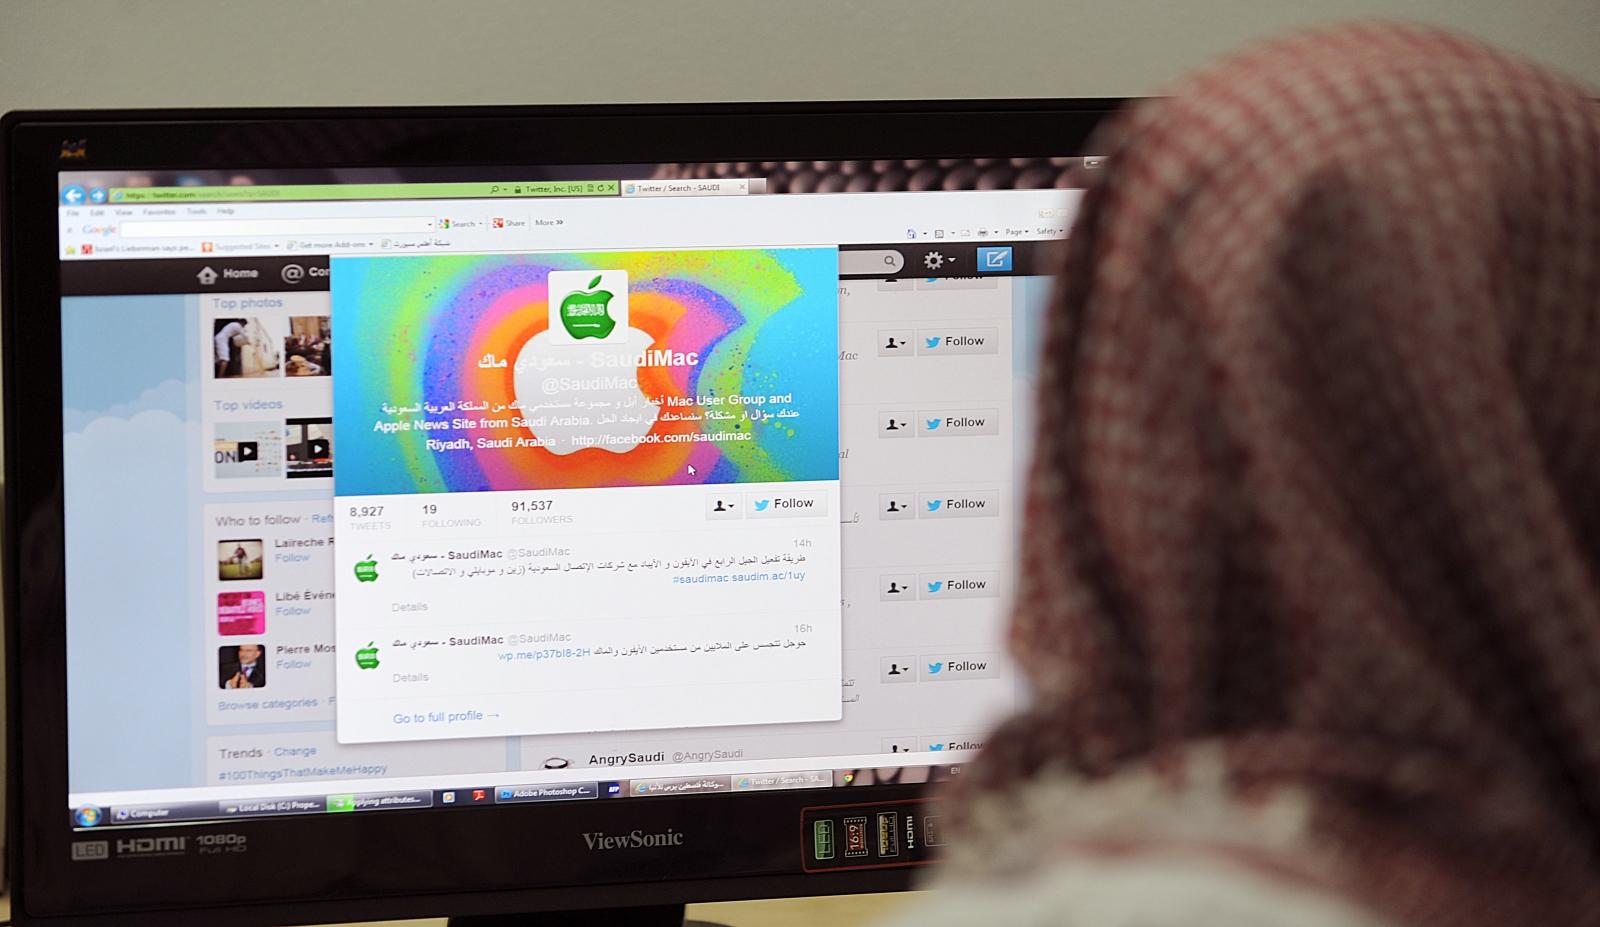 A Saudi man browses Twitter in Riyadh